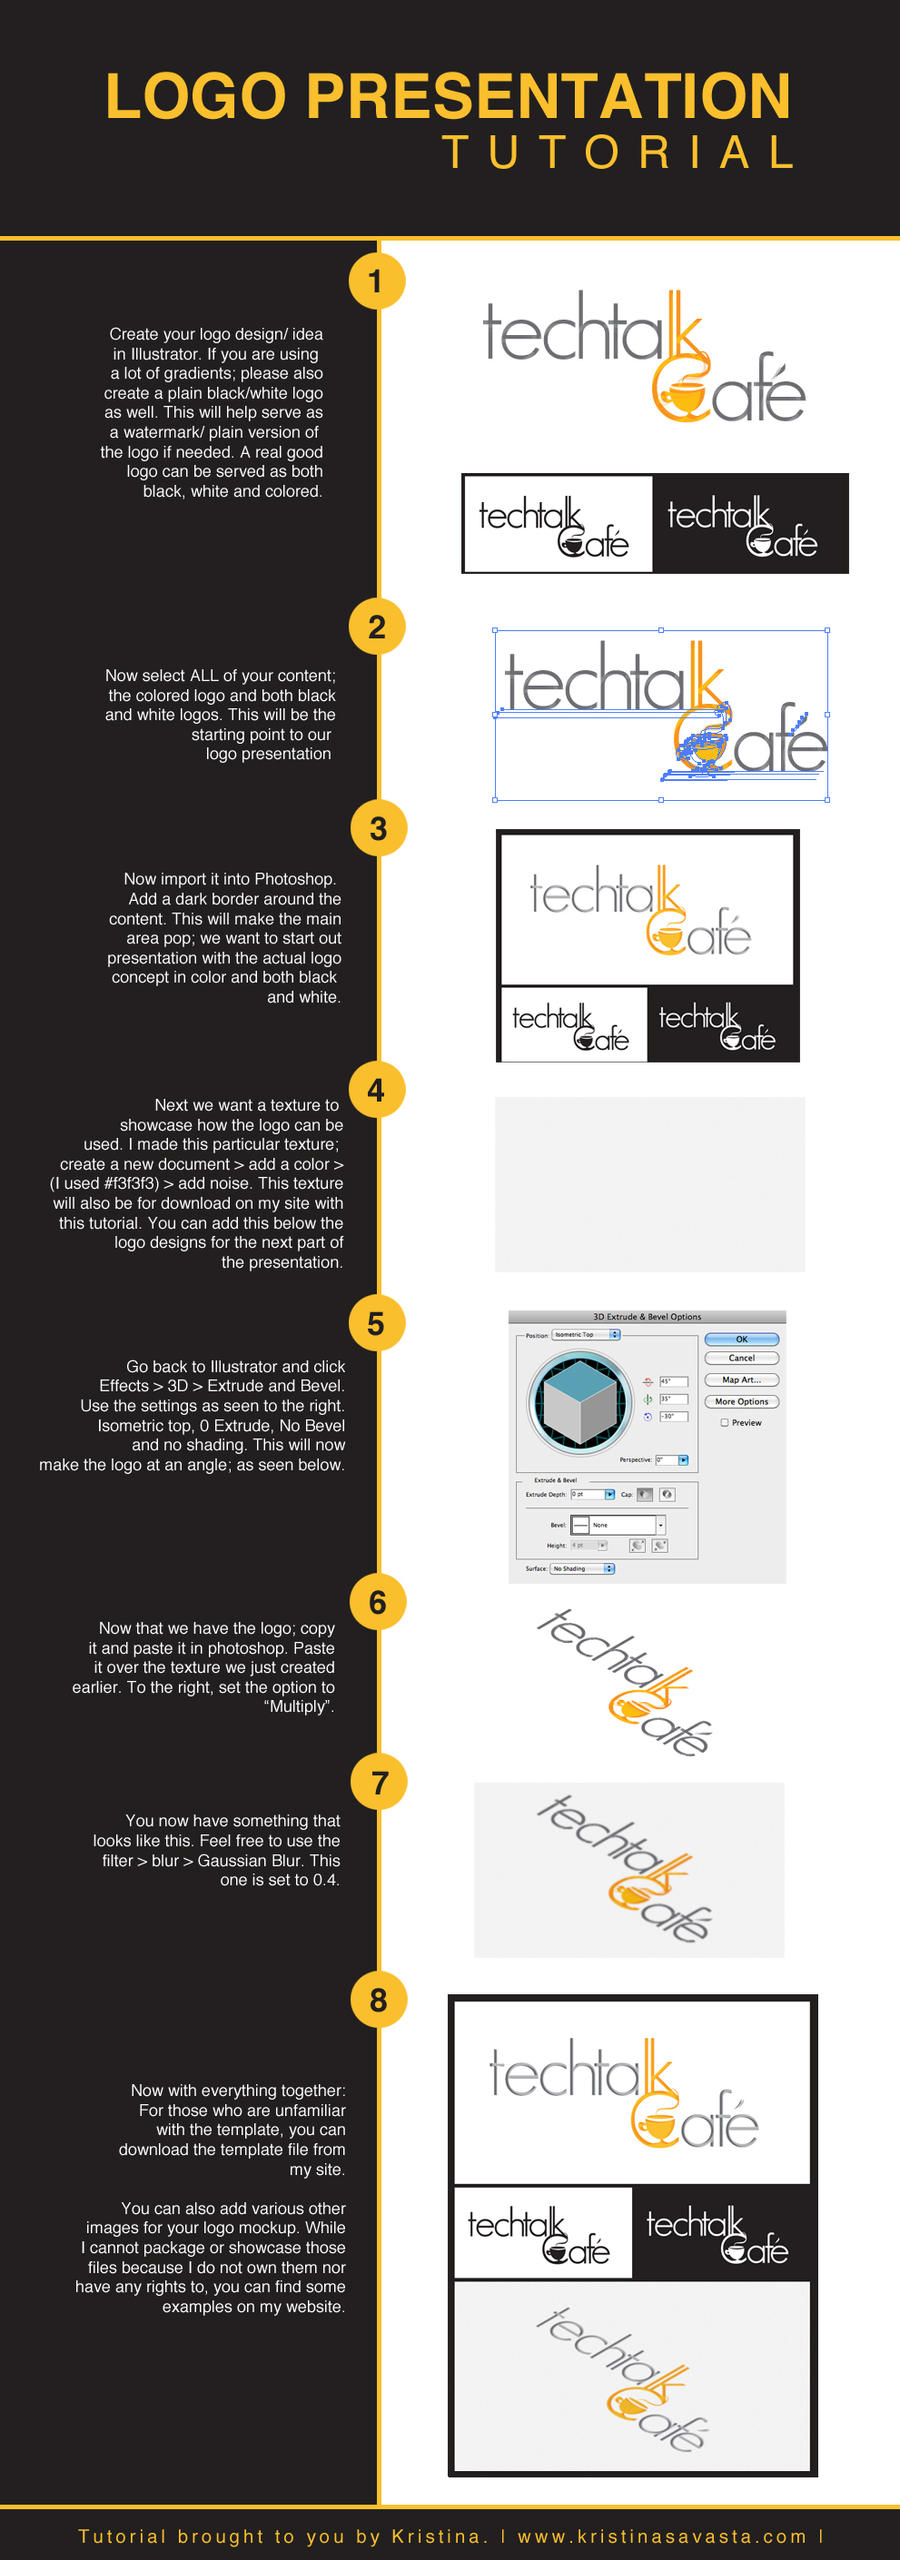 Simple Logo Presentation Tutorial by Tylon